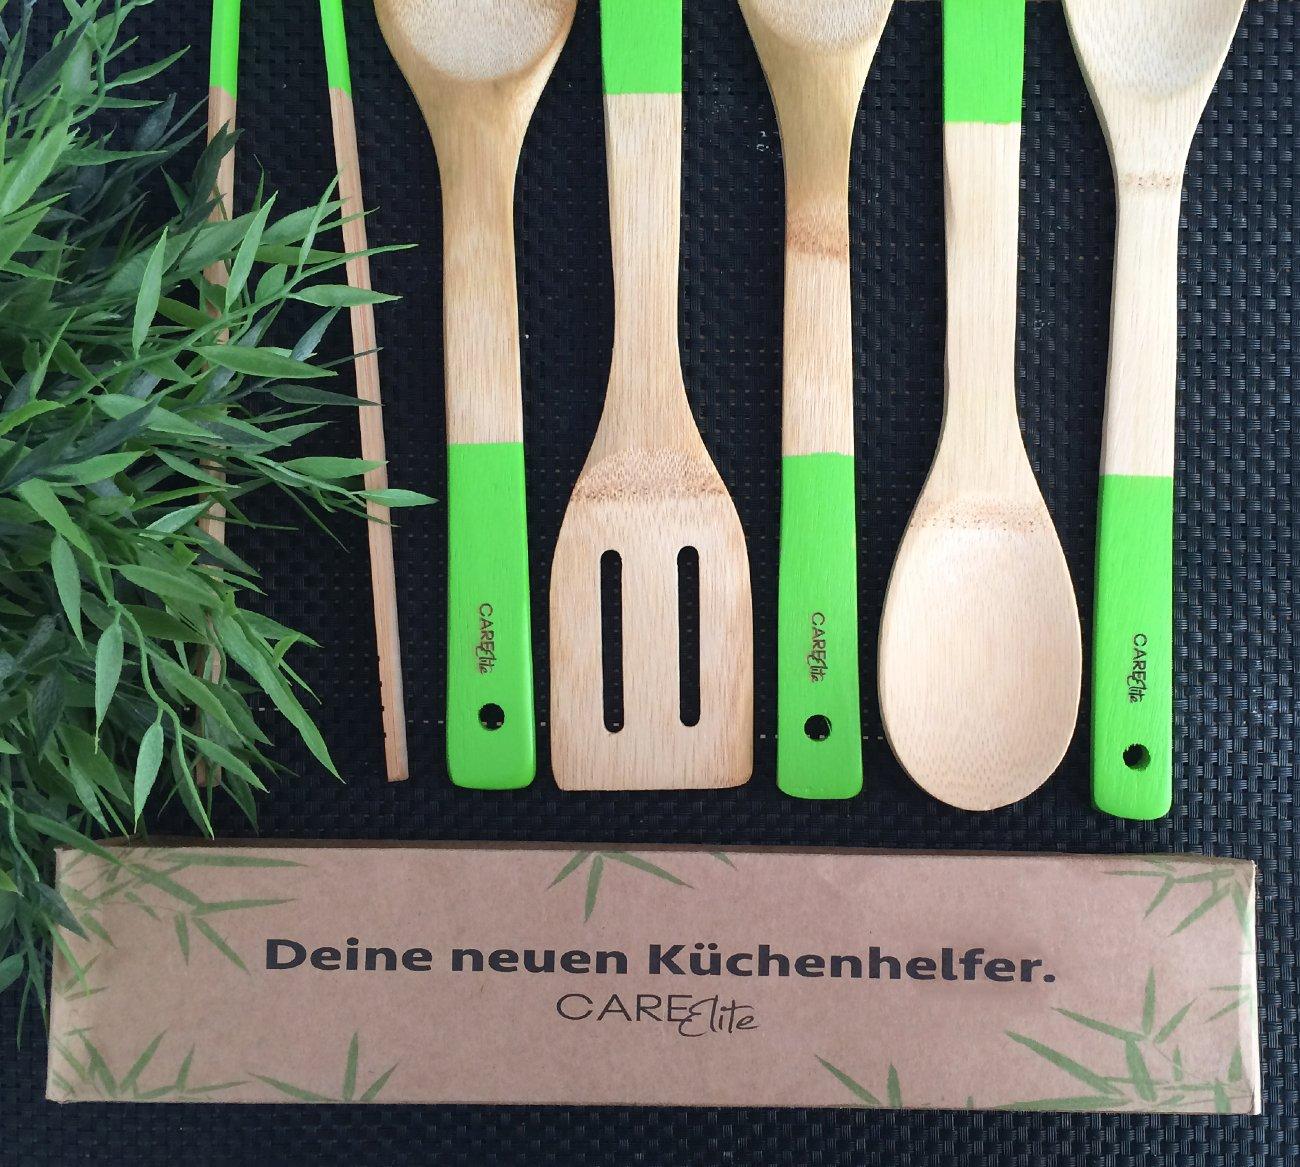 6er-Set Küchenhelfer aus Bambus-Holz ♻ Nachhaltige grüne ...